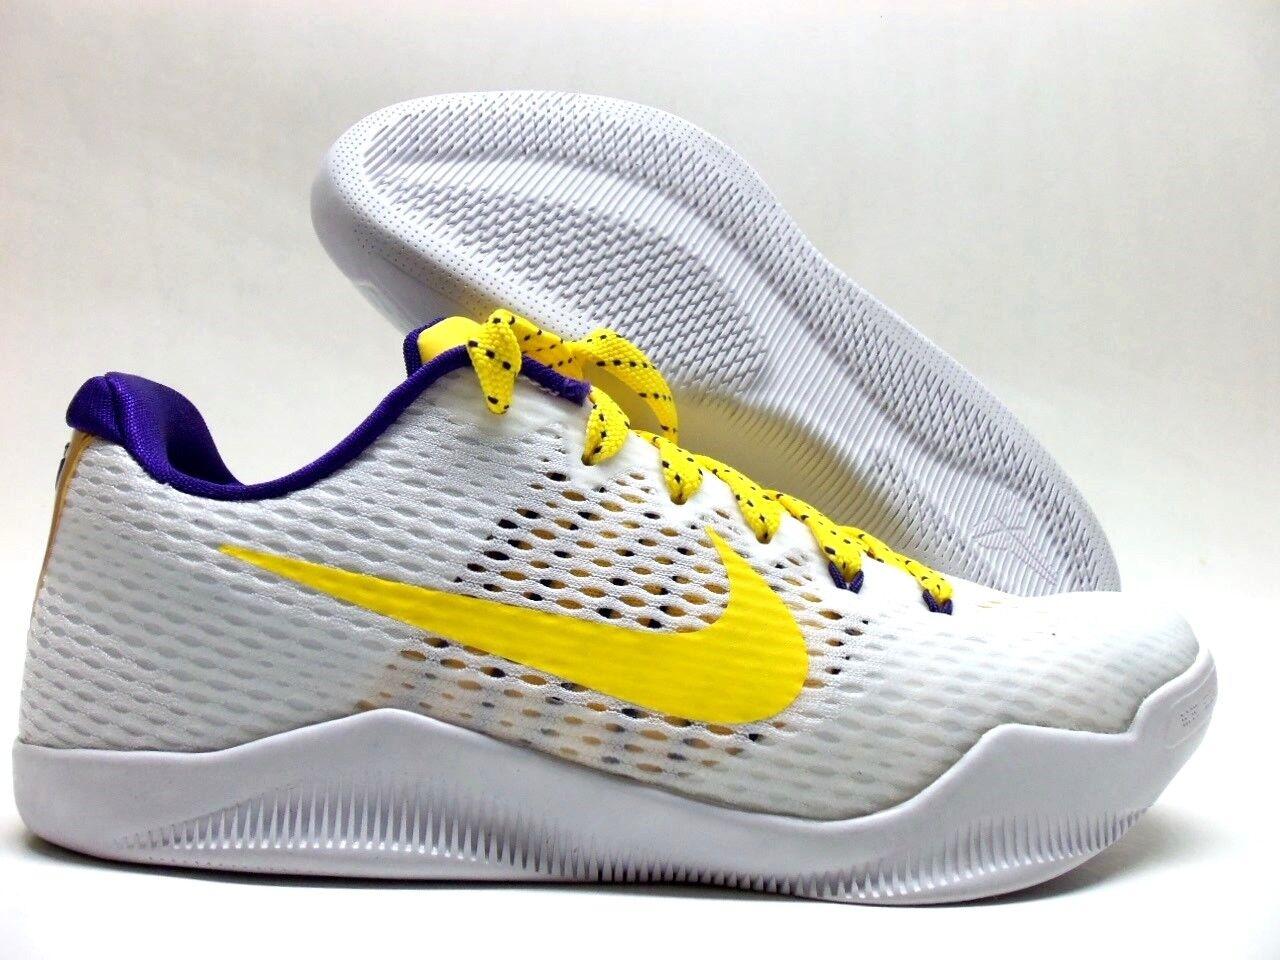 Nike kobe xi 11 qs mamba giorno id bianco / canyon gold-purple sz uomini 7 [865773-994]